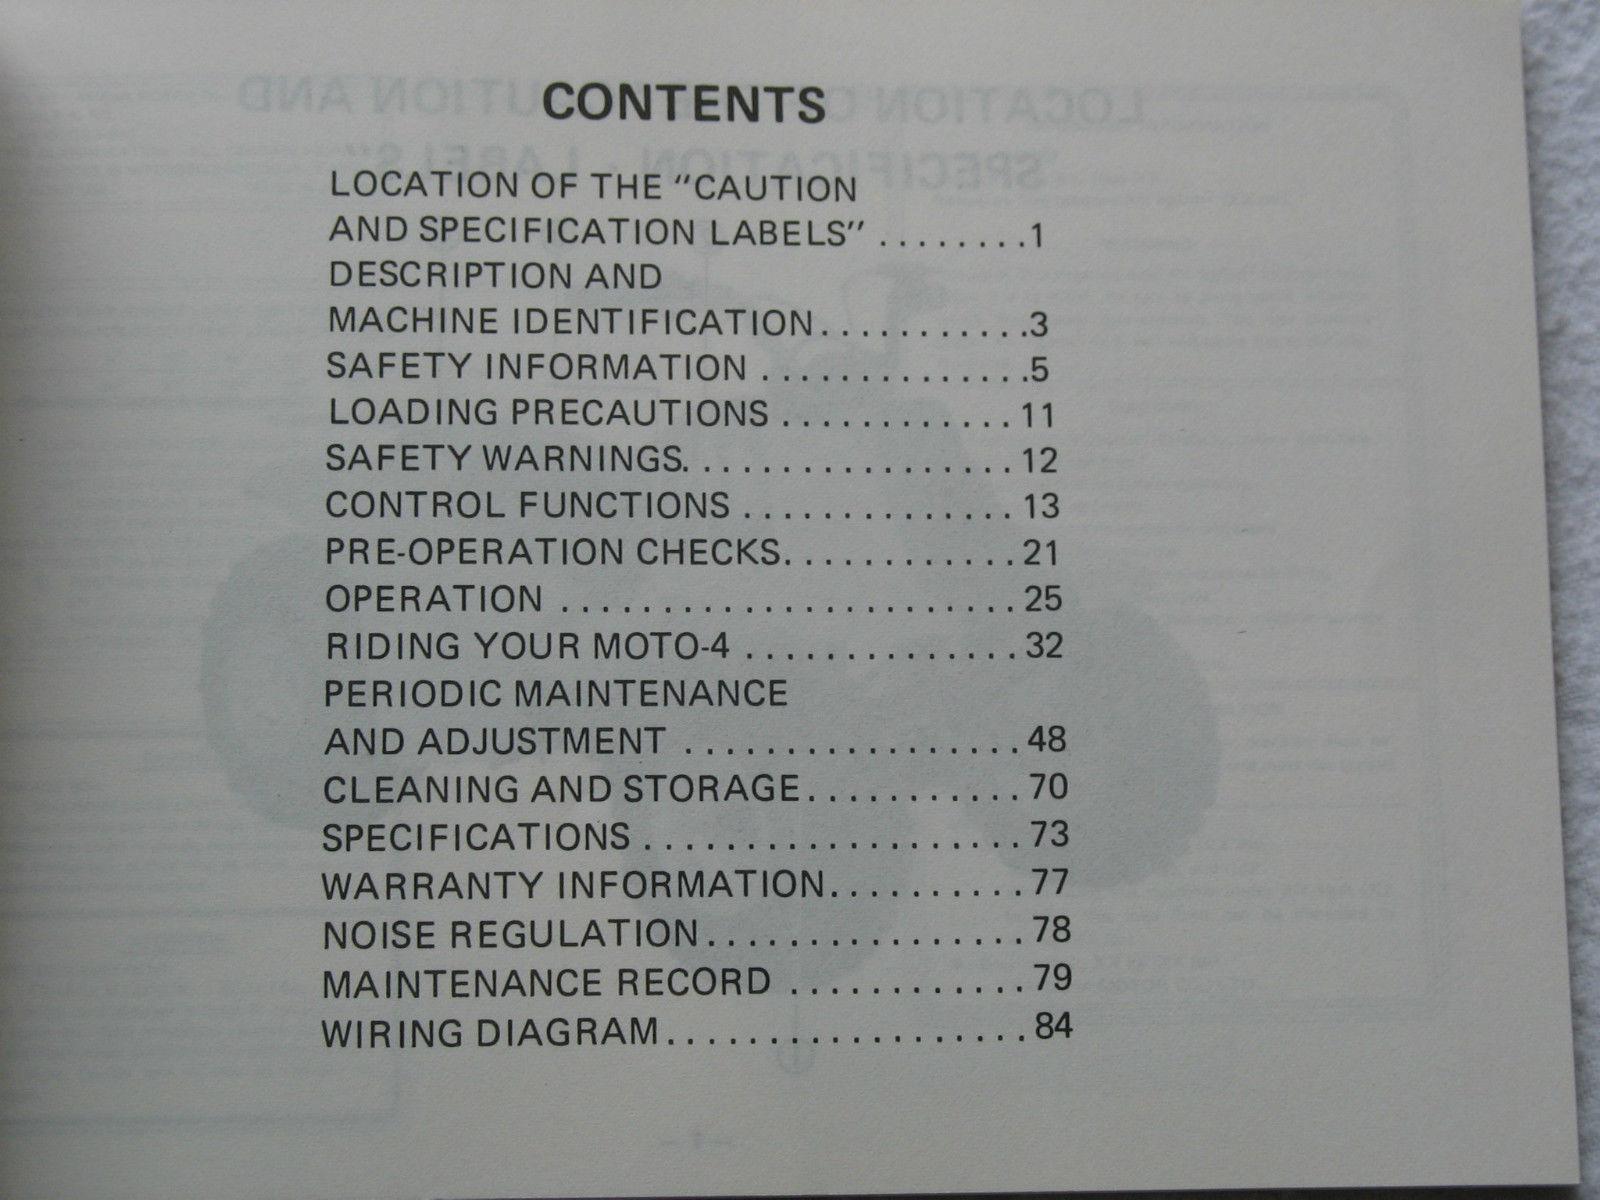 1985 85 Yamaha Badger Yfm80n Yfm80 Yfm 80 And 32 Similar Items Moto 4 80cc Wiring Diagram Owners Owner Service Manual